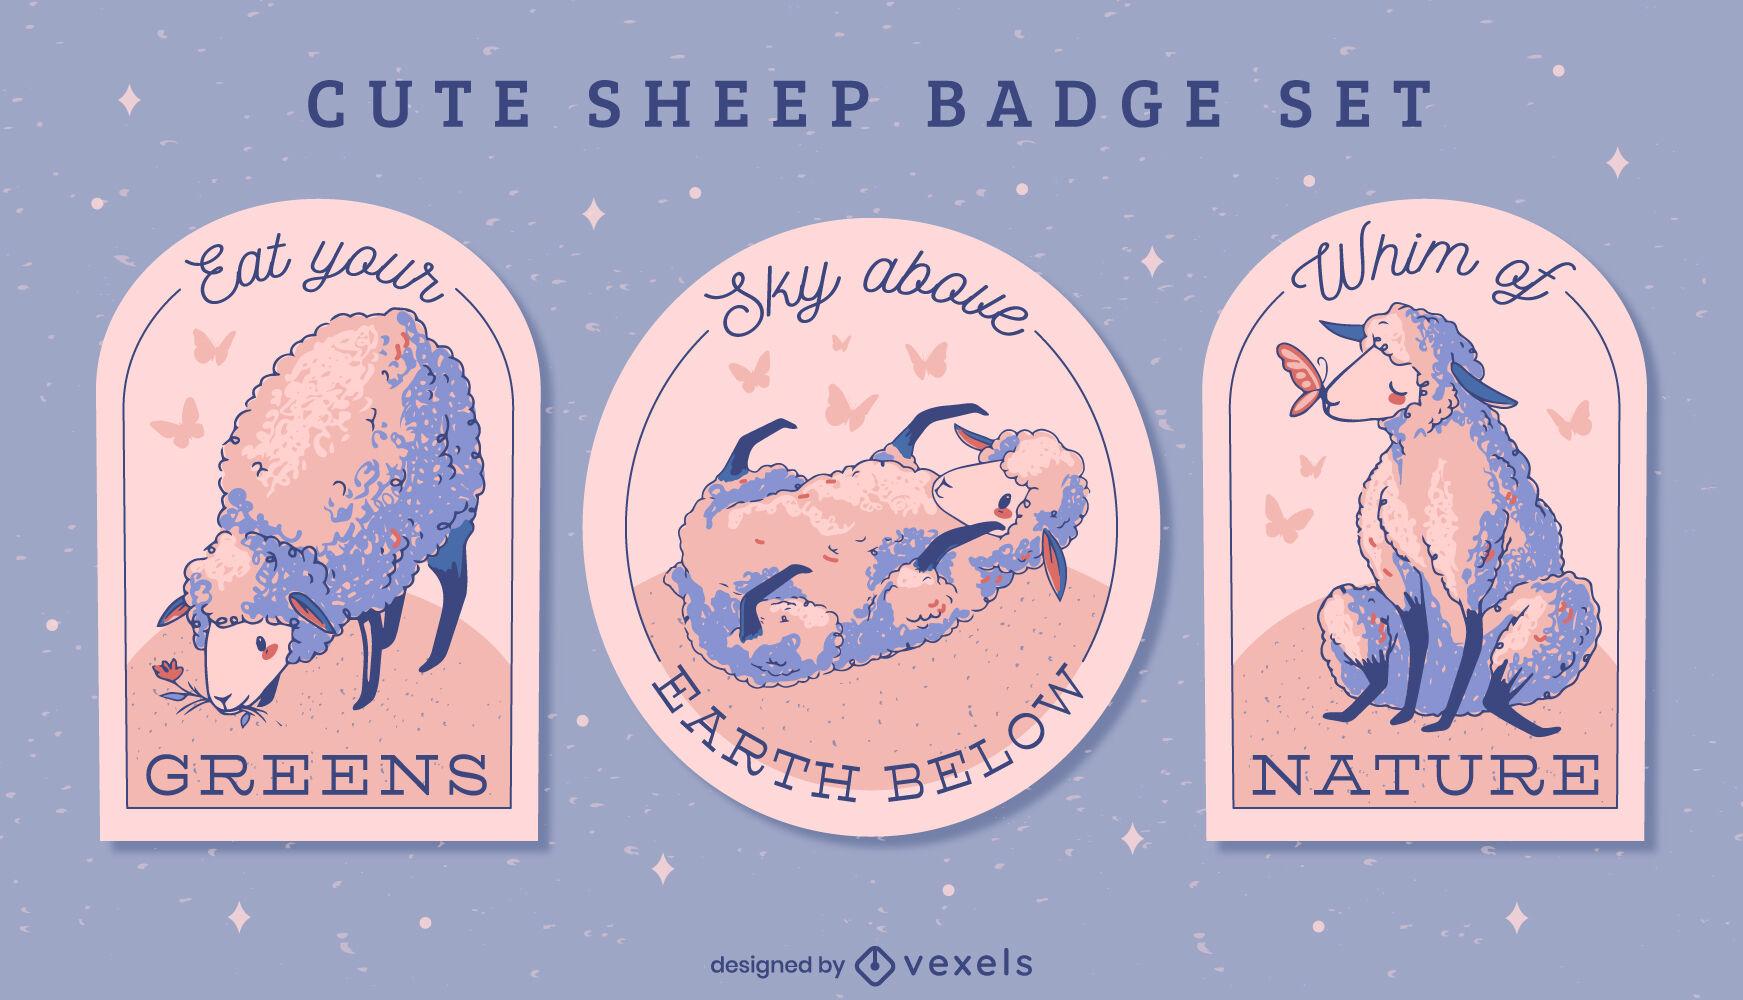 Cute sheep badge illustrations set